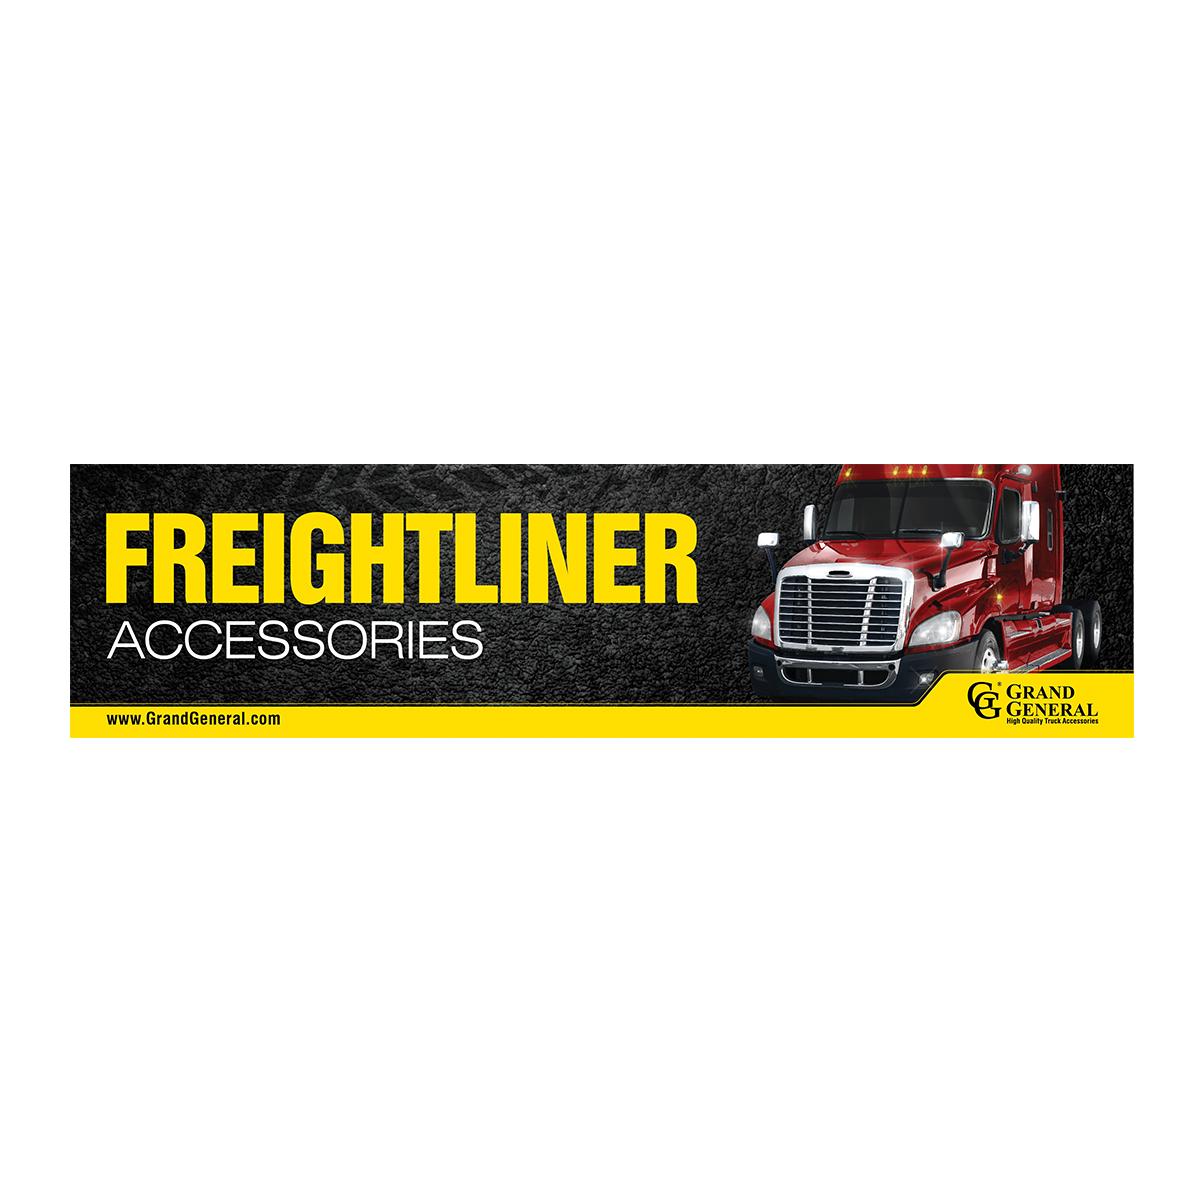 Freightliner Accessories Display Sign